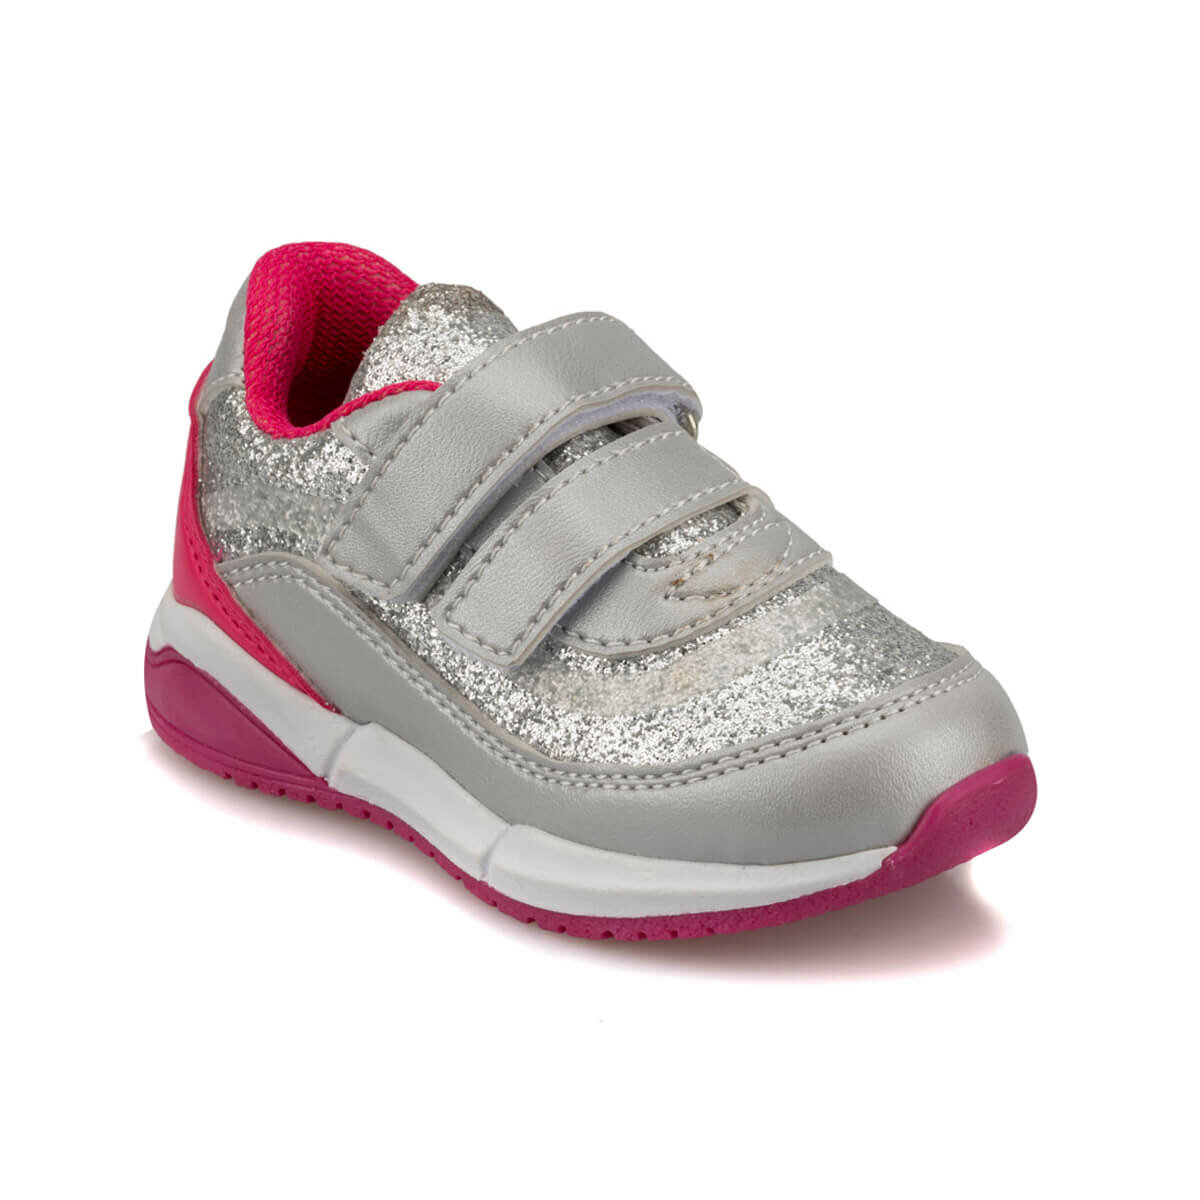 FLO 92.511754.B Silver Female Child Sneaker Shoes Polaris